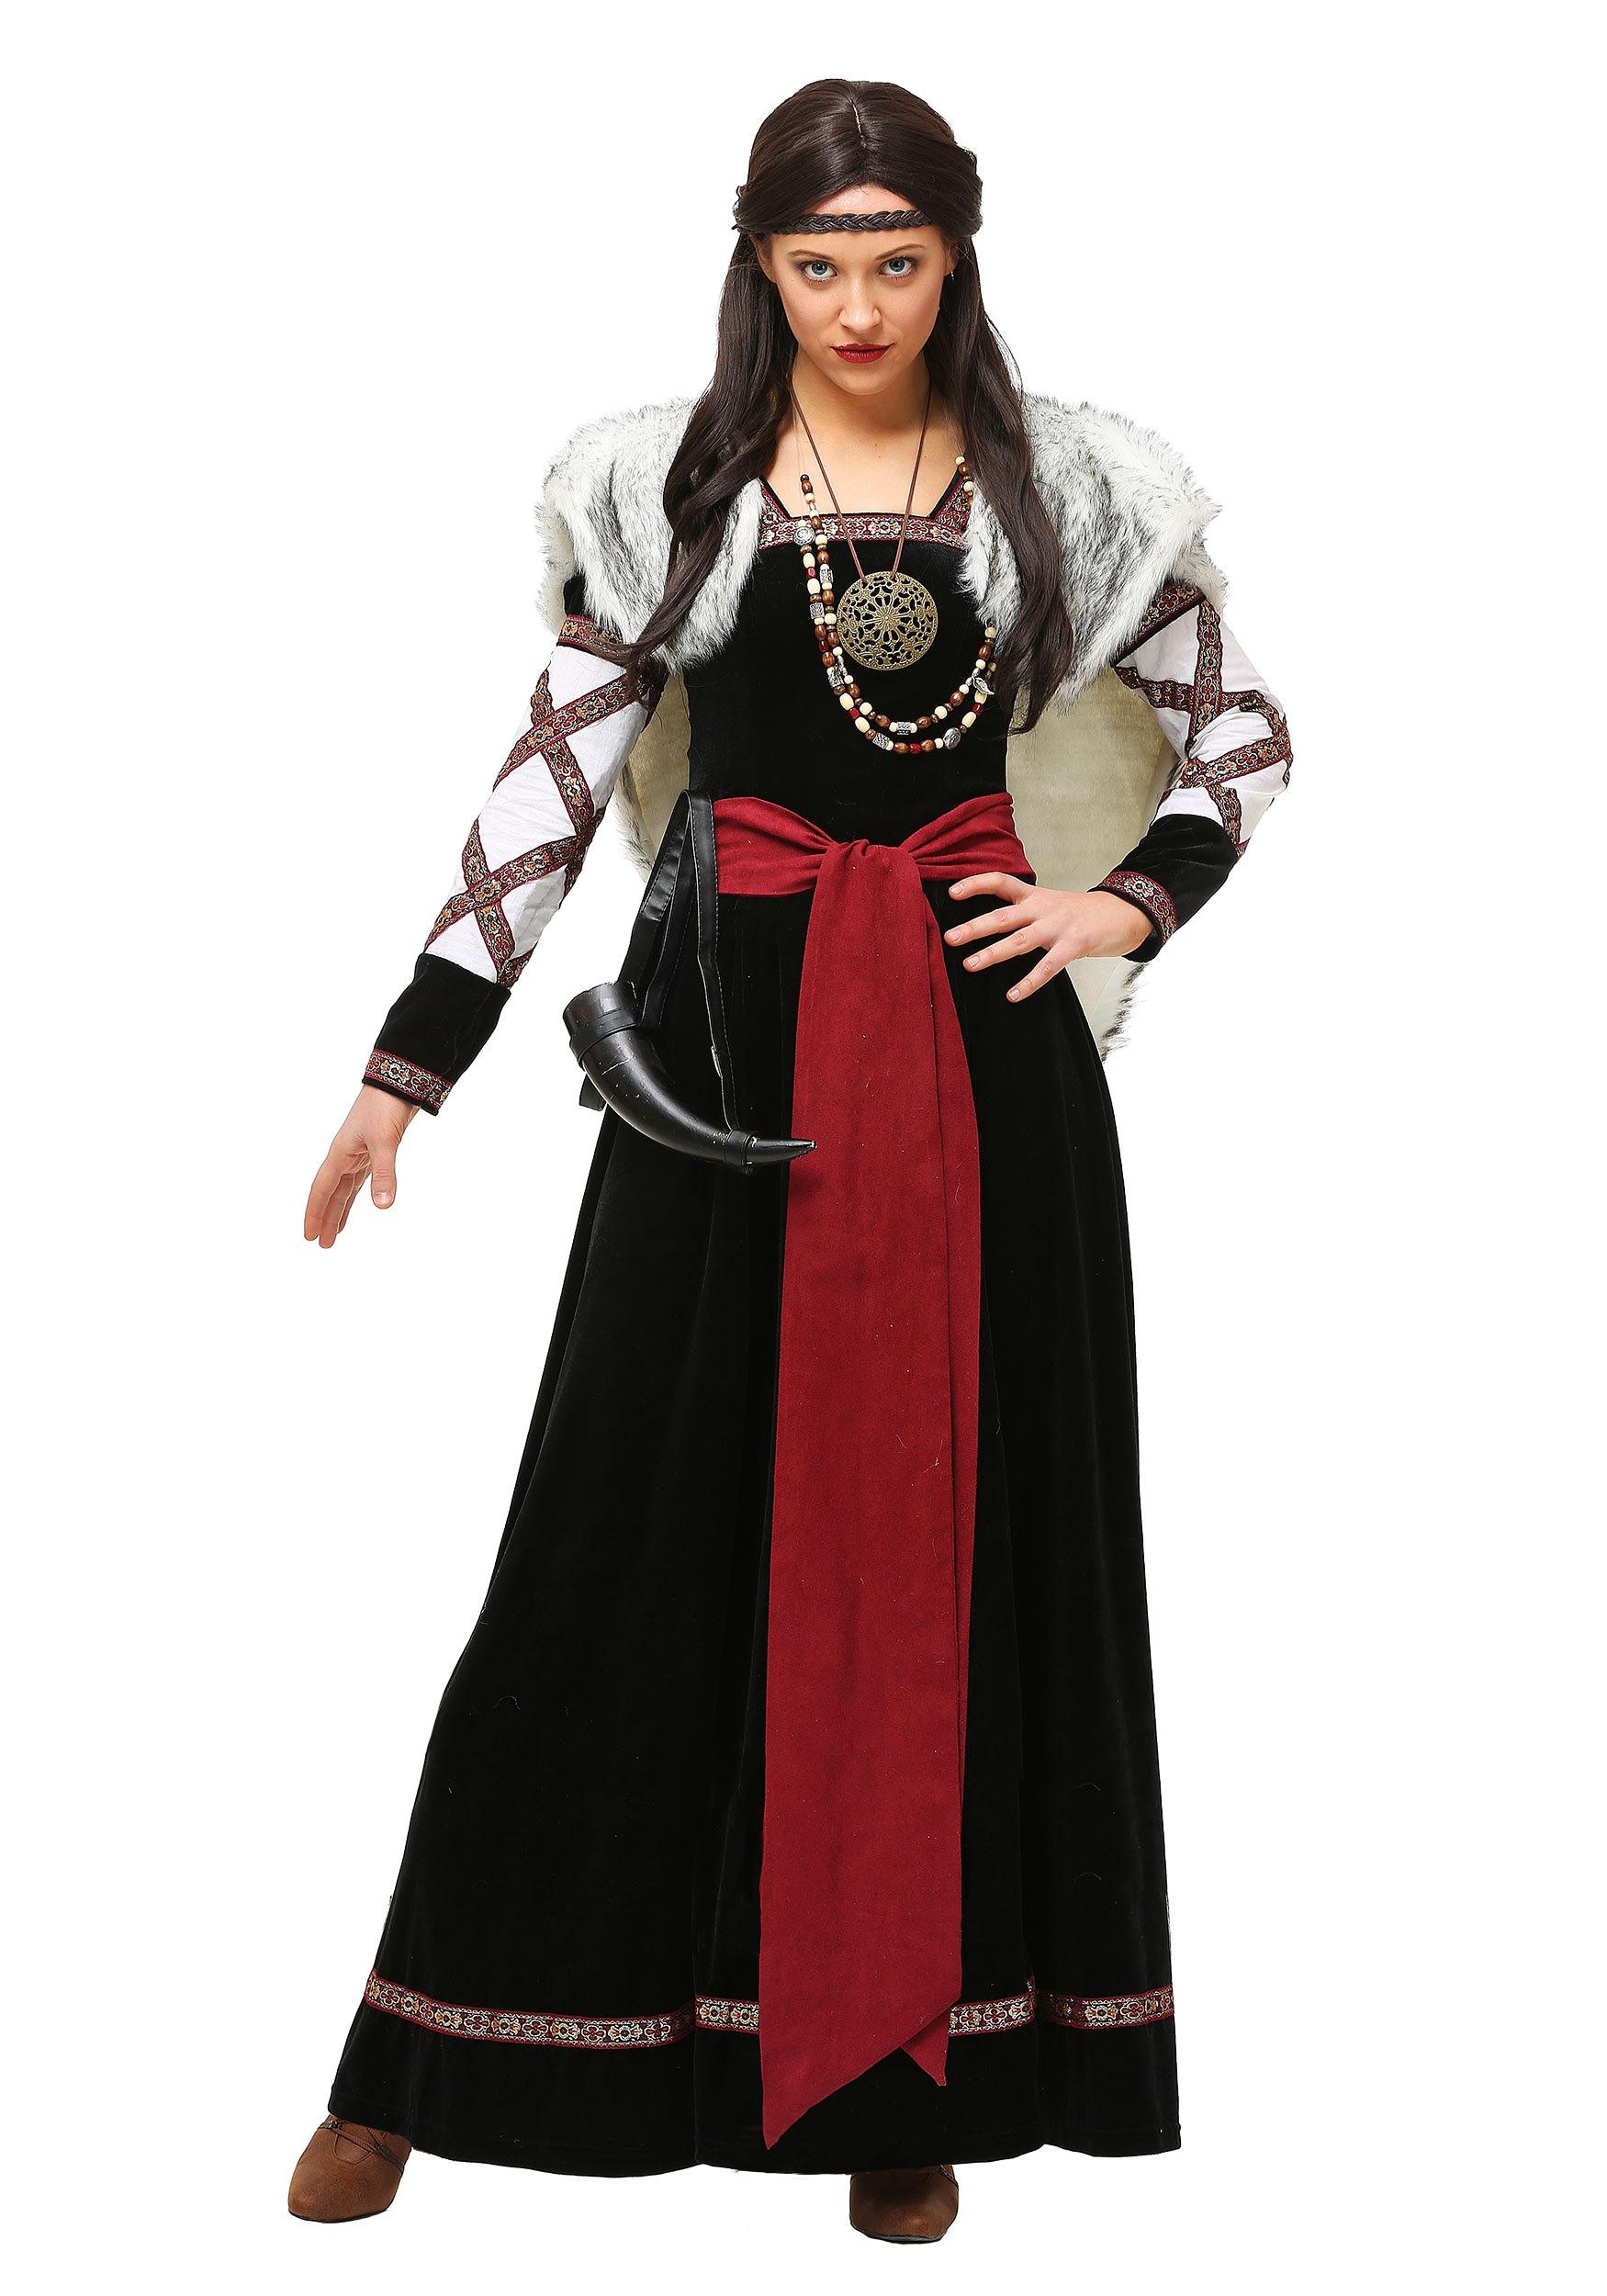 Dark Viking Dress Costume for Women